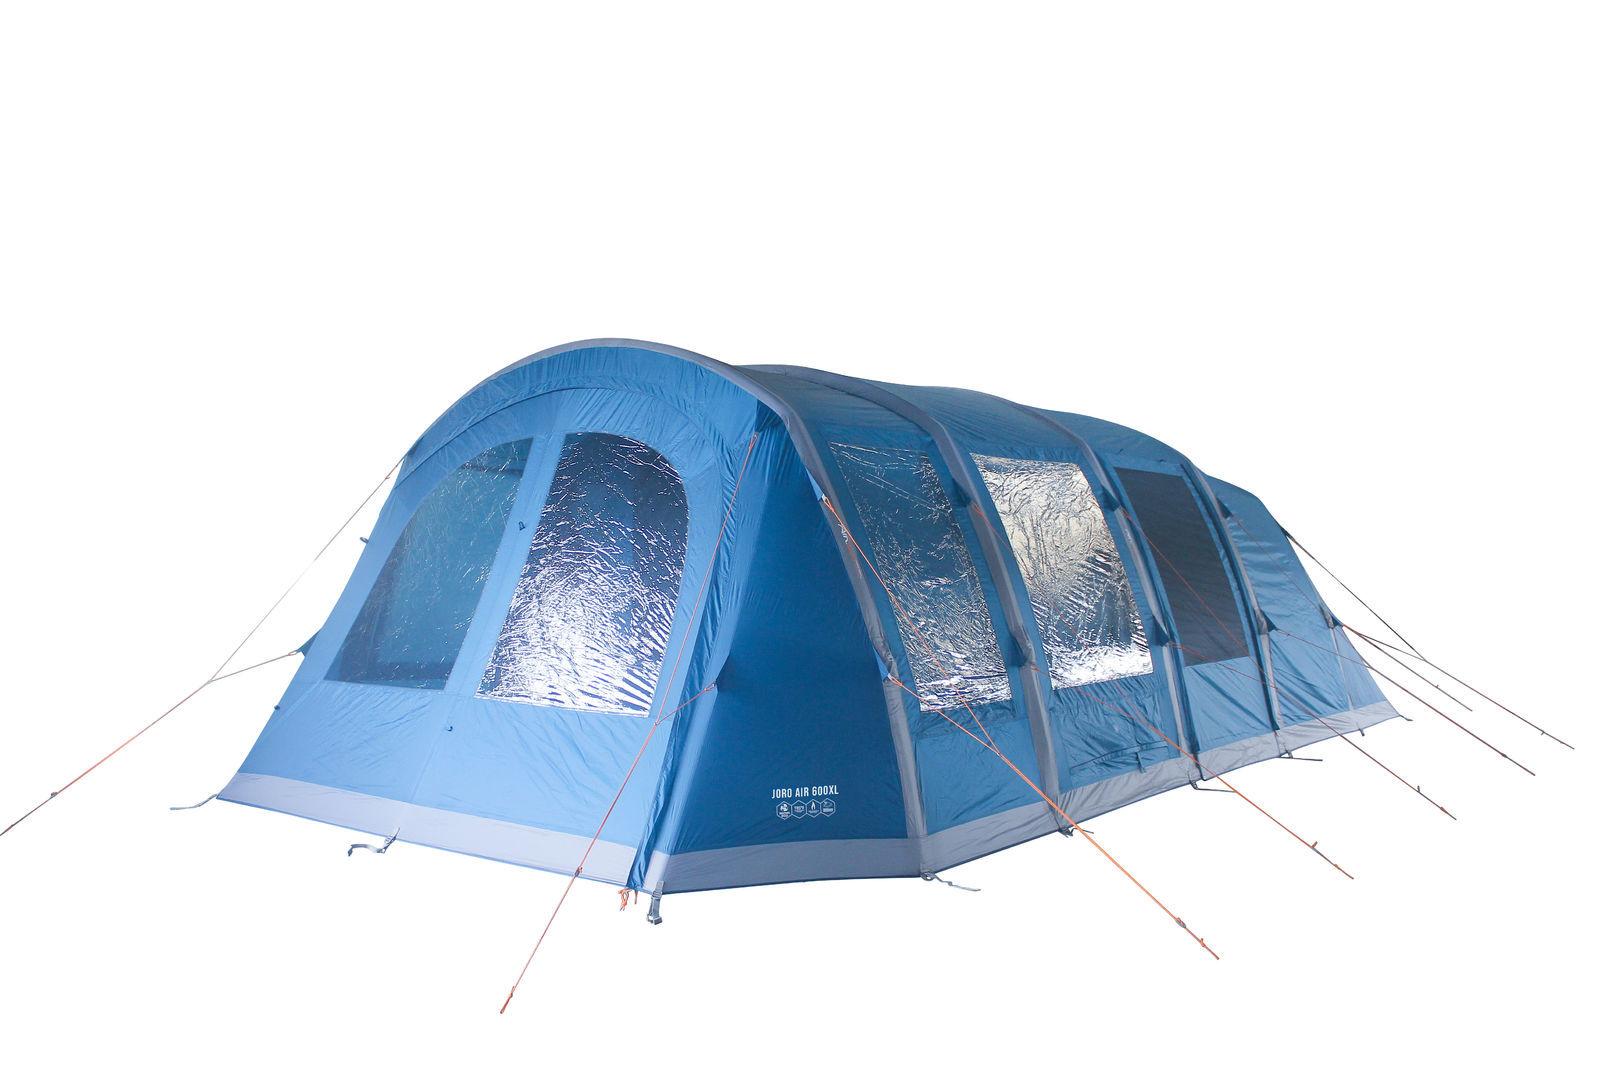 Vango Joro 600Xl Air Tent 2021 Norwich Camping 1